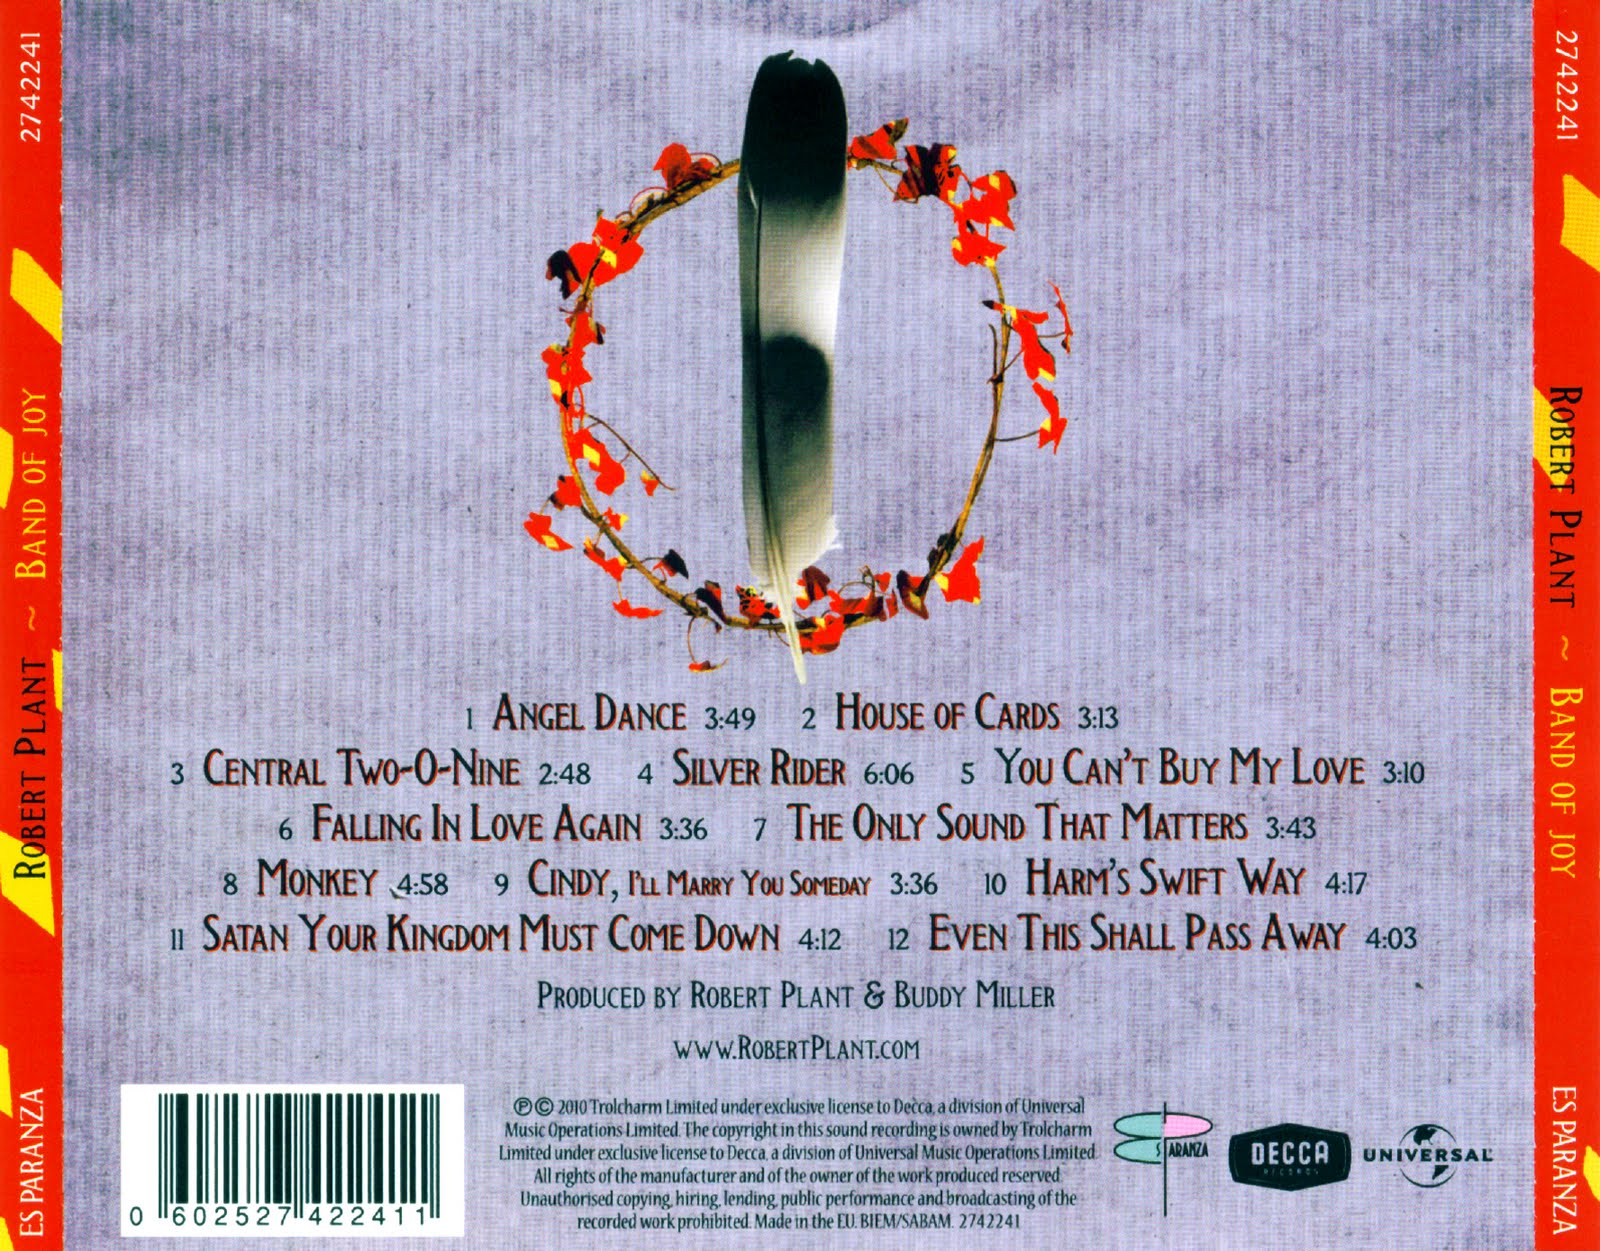 http://2.bp.blogspot.com/-Q1Ej2_OyzF4/TiwGjA9YvmI/AAAAAAAABms/2va198RDfds/s1600/Robert_Plant_-_Band_Of_Joy_-_Back.jpg